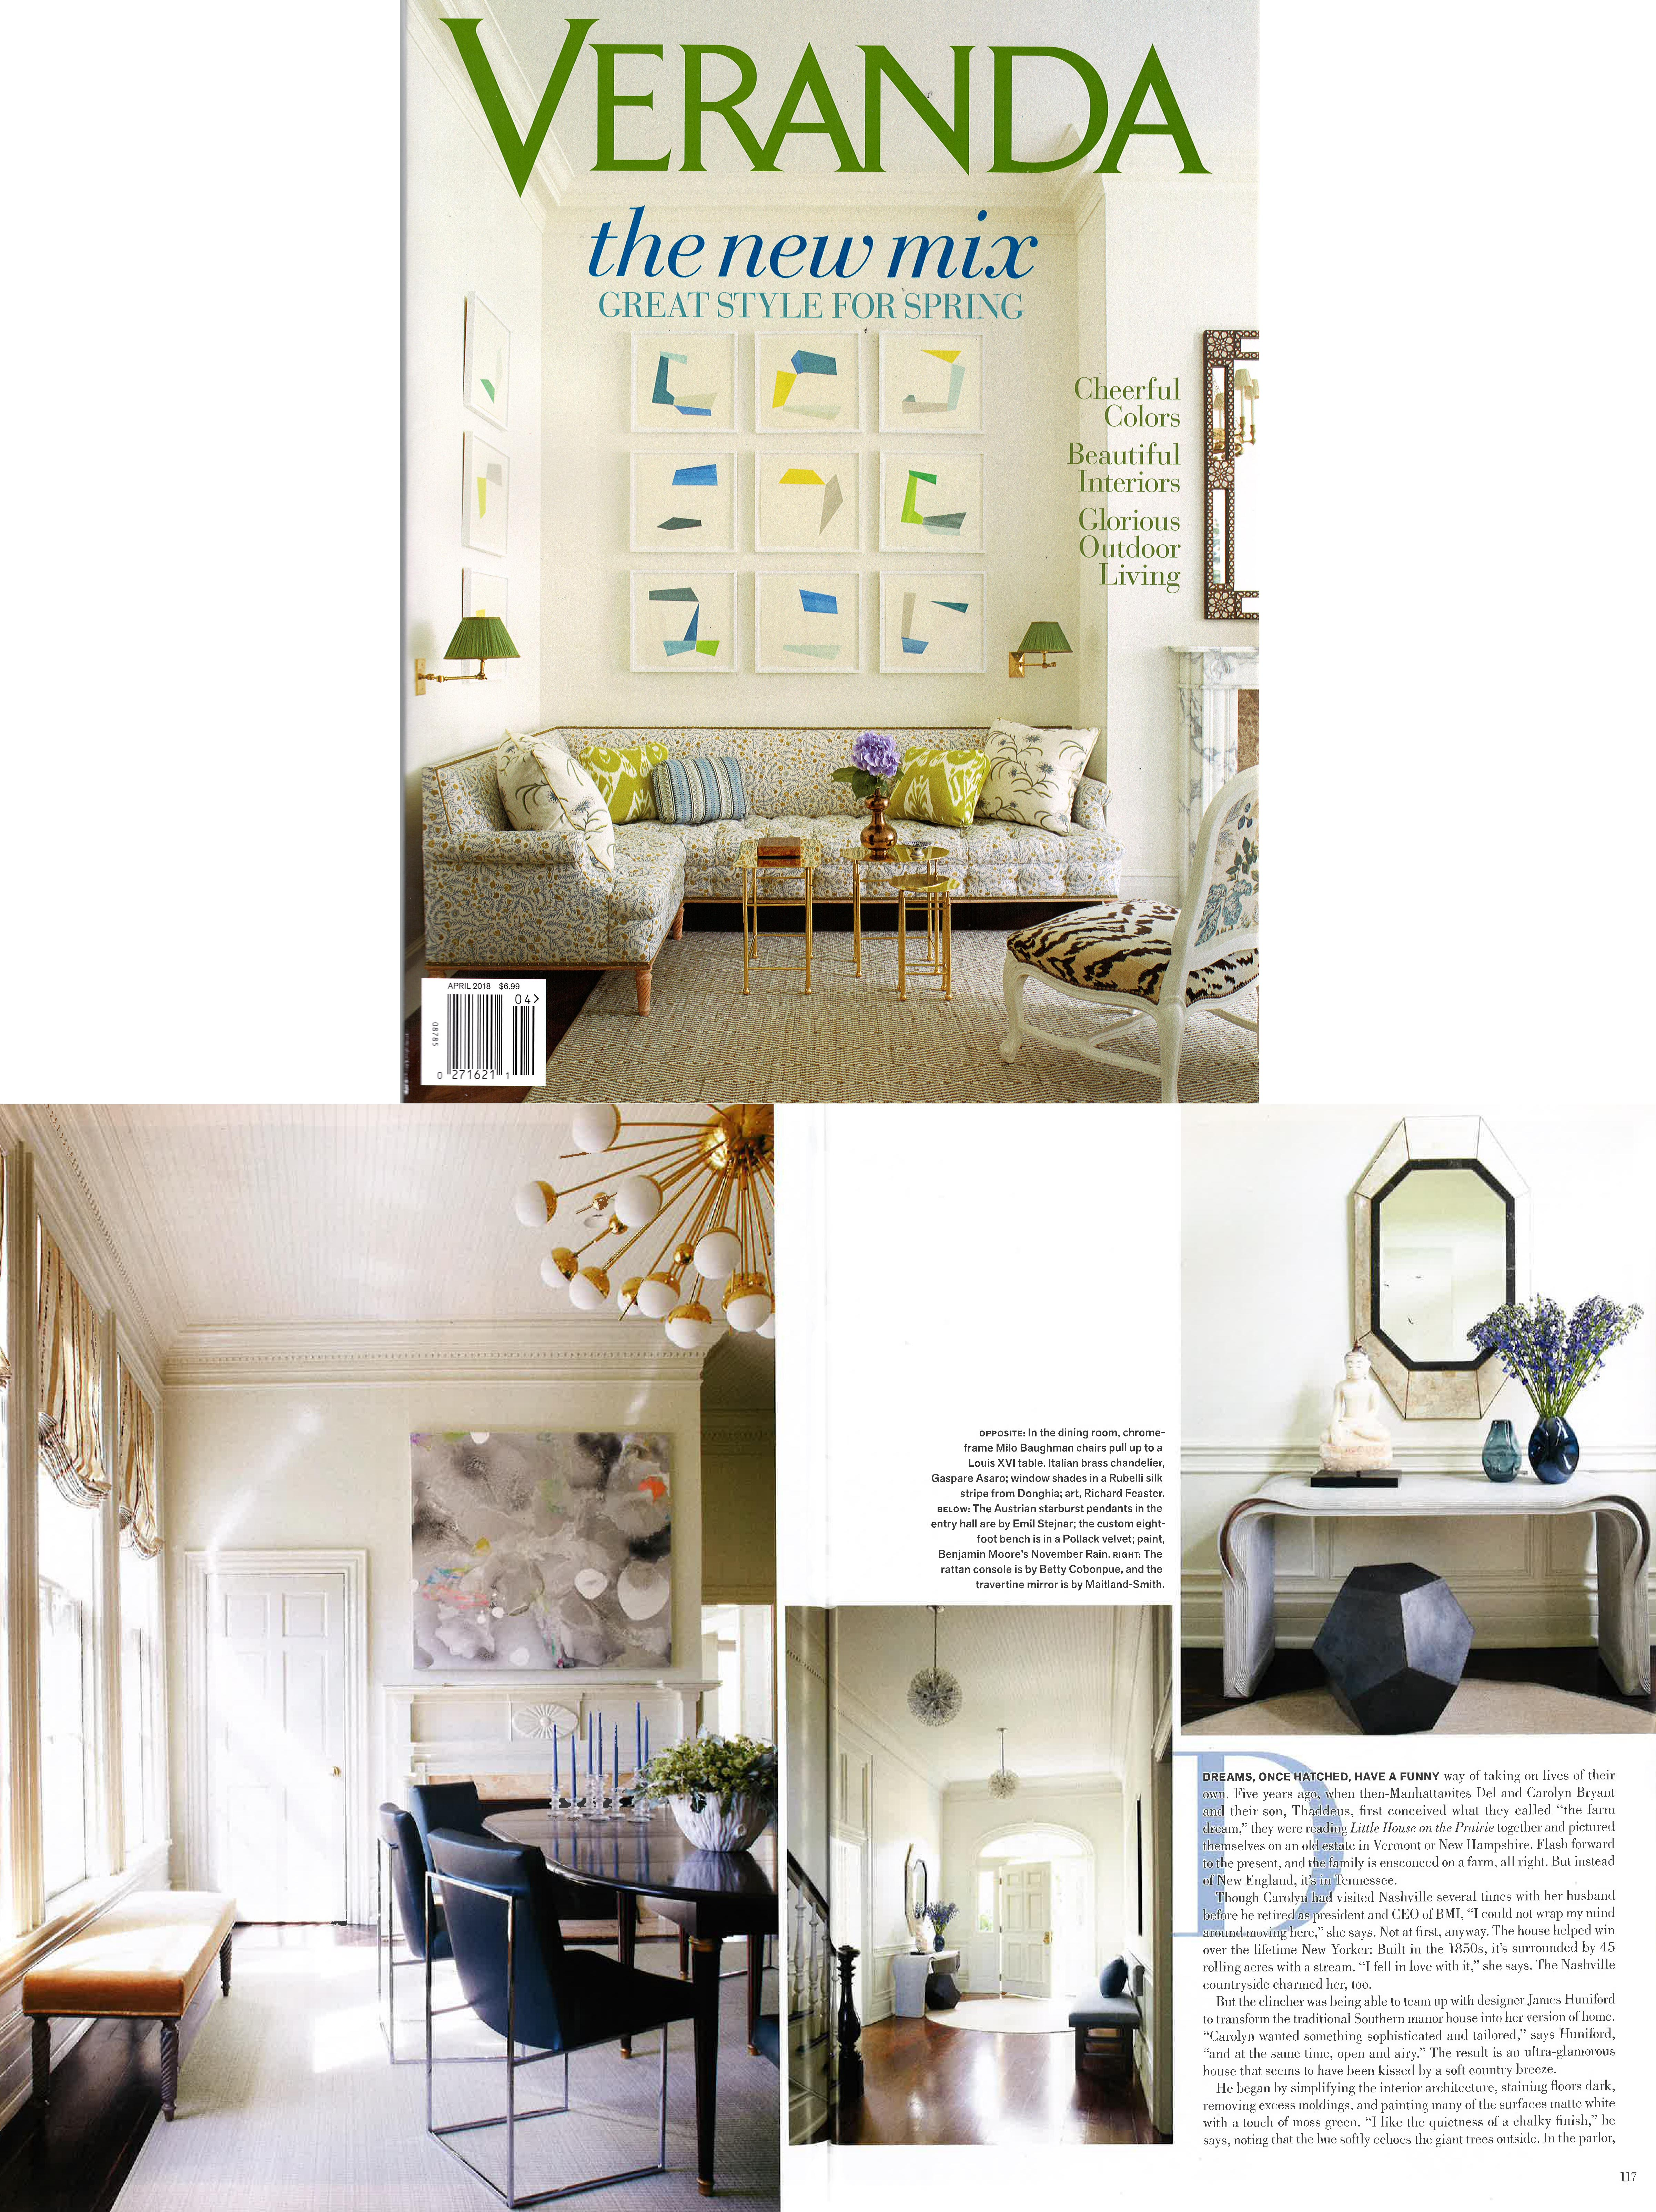 Richard Feaster Veranda Magazine